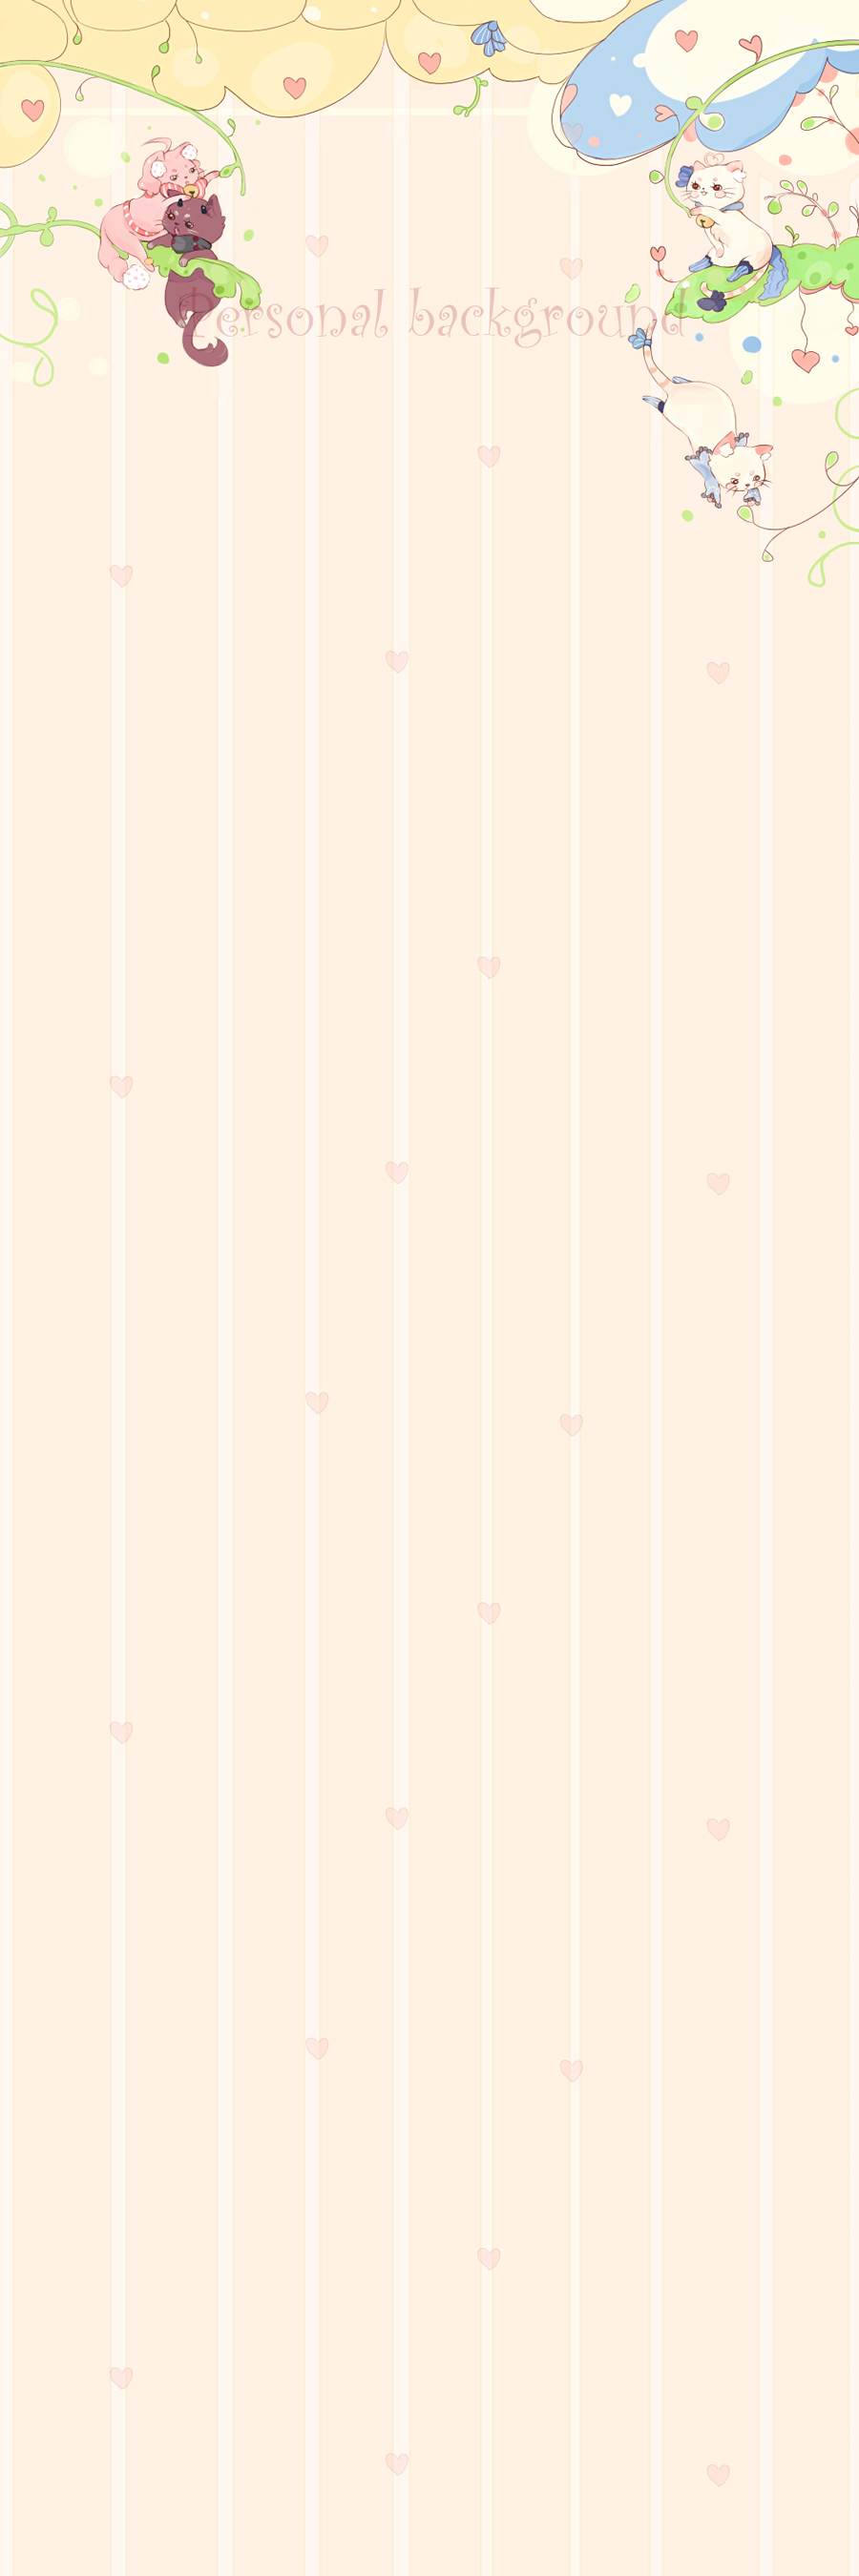 Custom Background commission for Reiyaa by Mimru